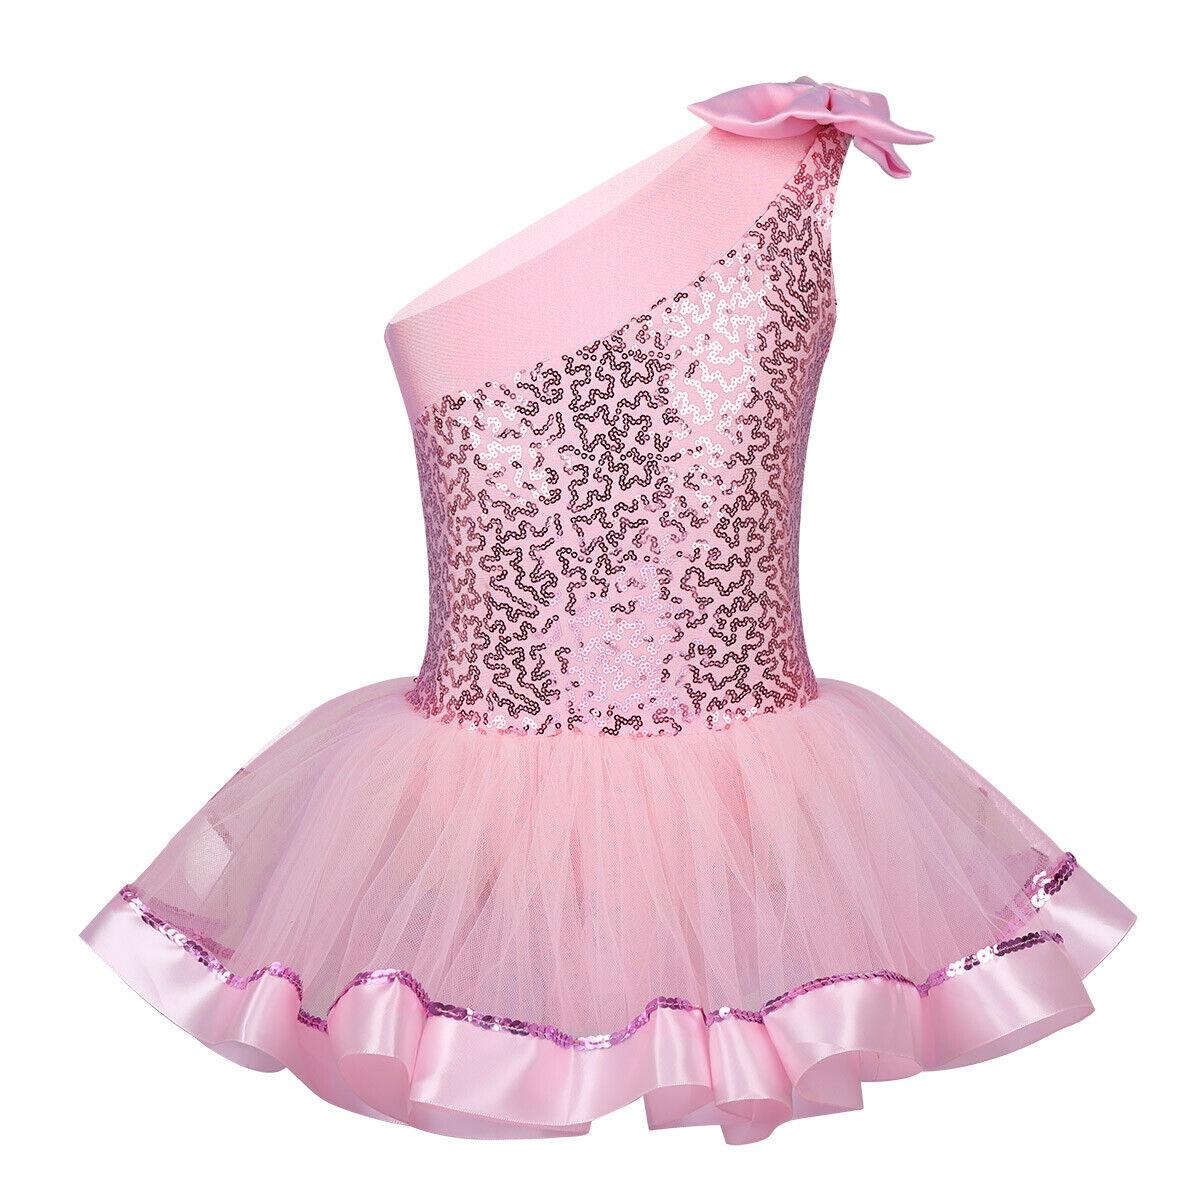 Child Girls Ballet Dancewears Leotard Tutu Dress Outfits Kid Skirt Costumes Suit